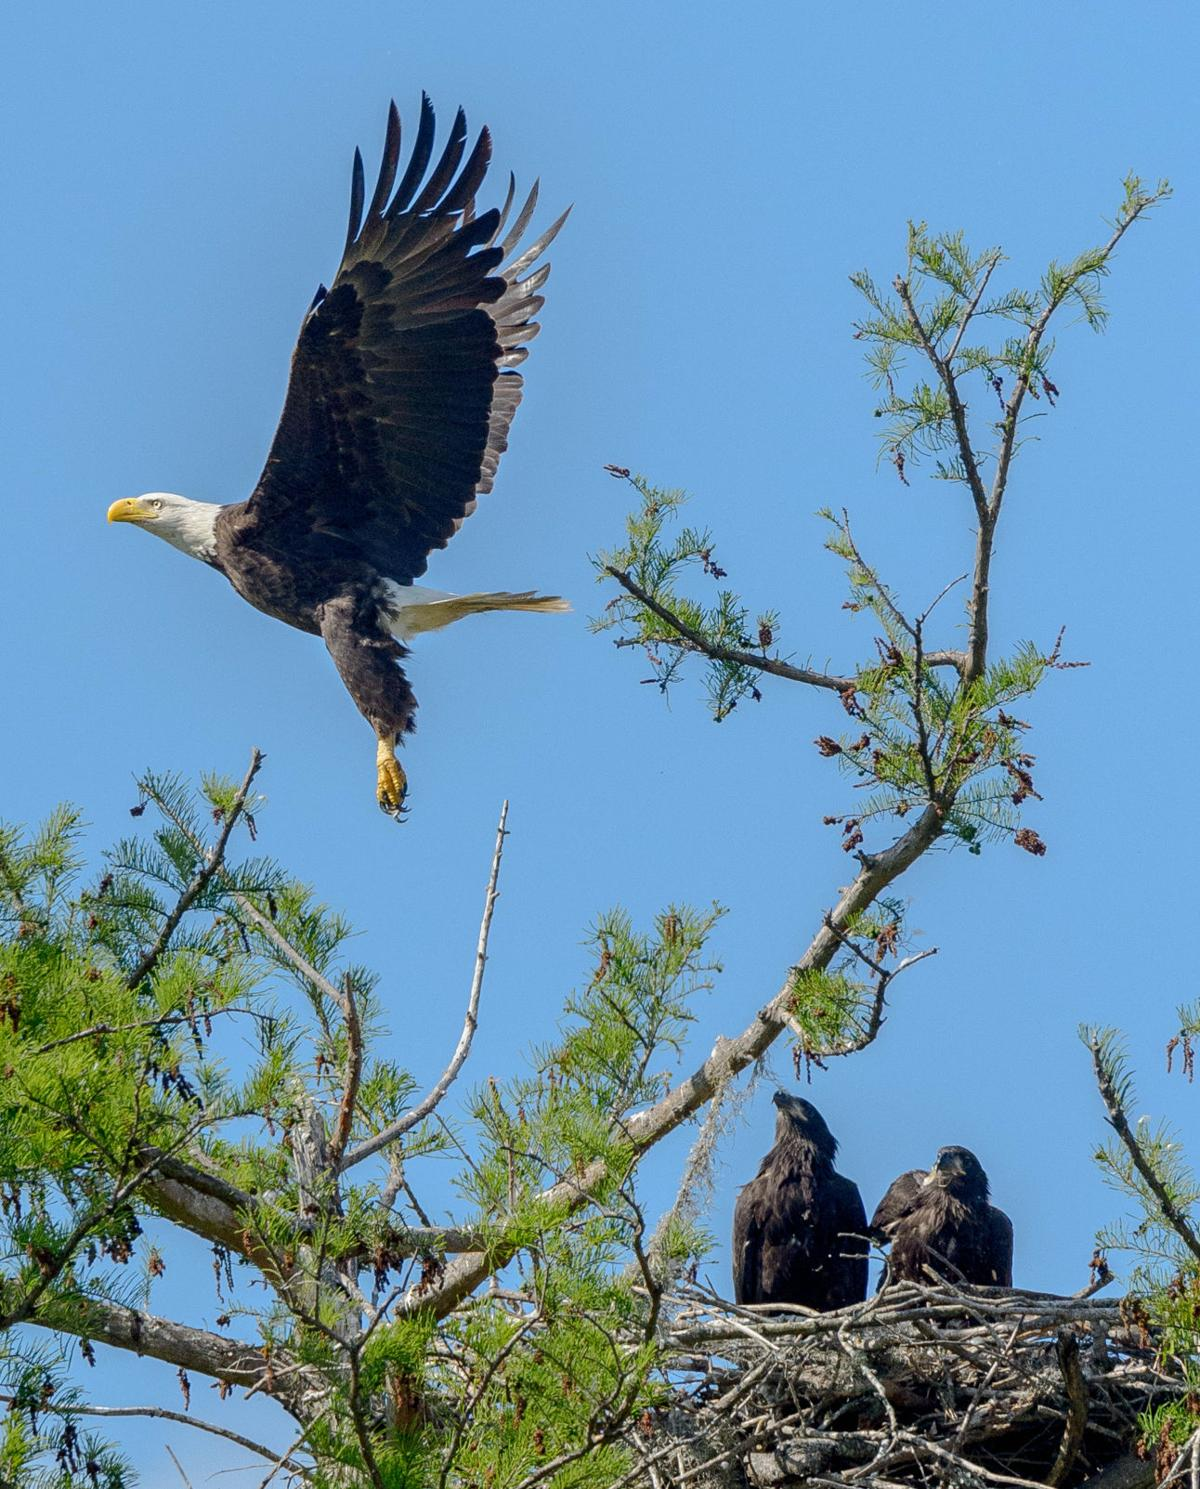 What Are The Predators Of Bald Eagles